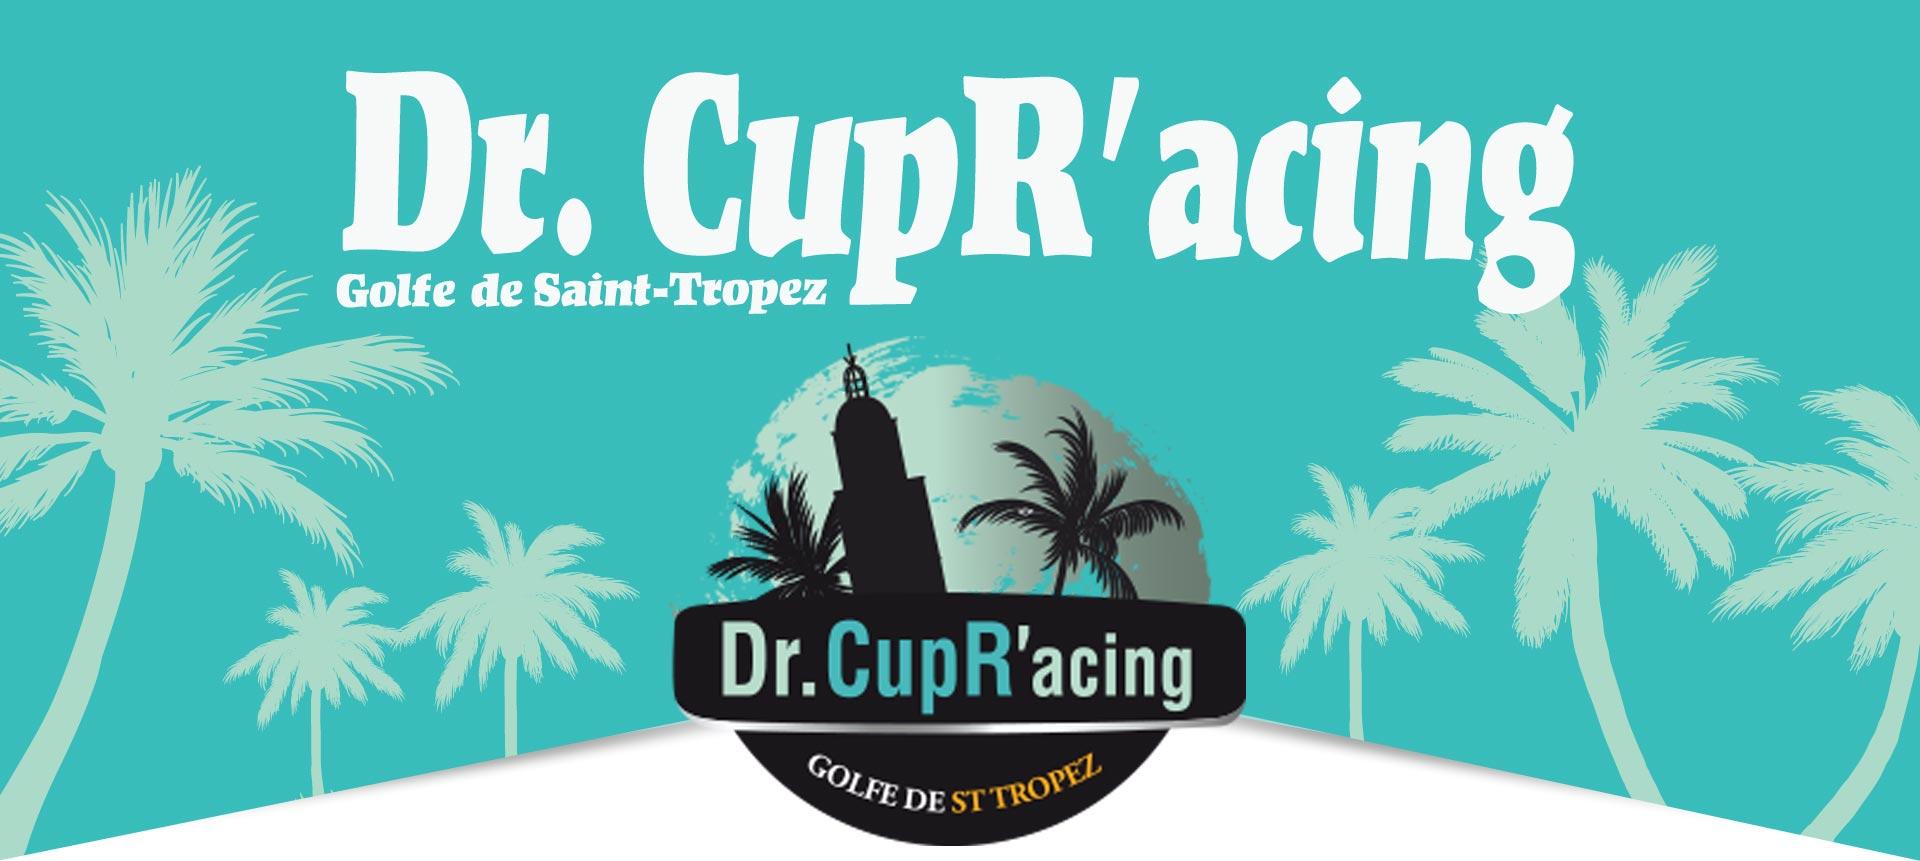 Dr. CuppeR'acing à Grimaud - logo header